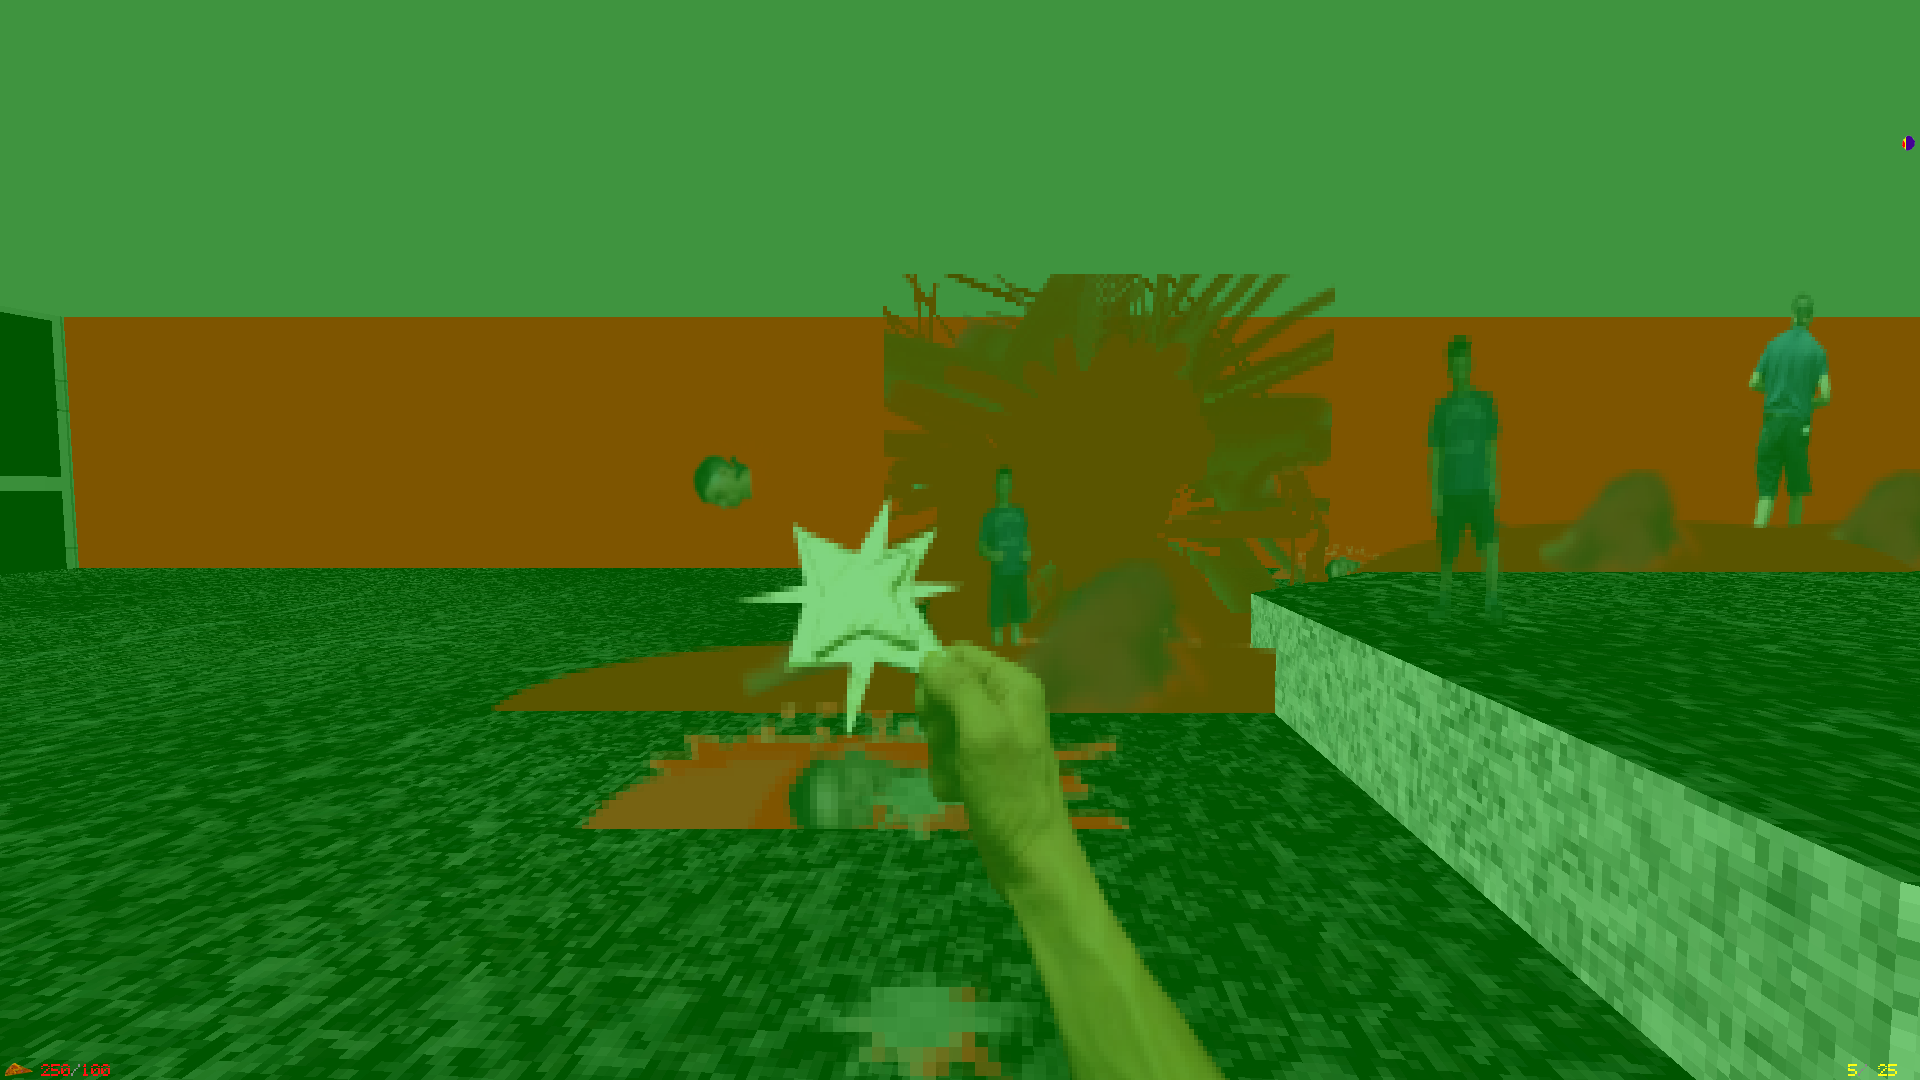 Screenshot_Doom_20201221_142207_04.png.768d260dce720cb842eaa01c7680cd25.png